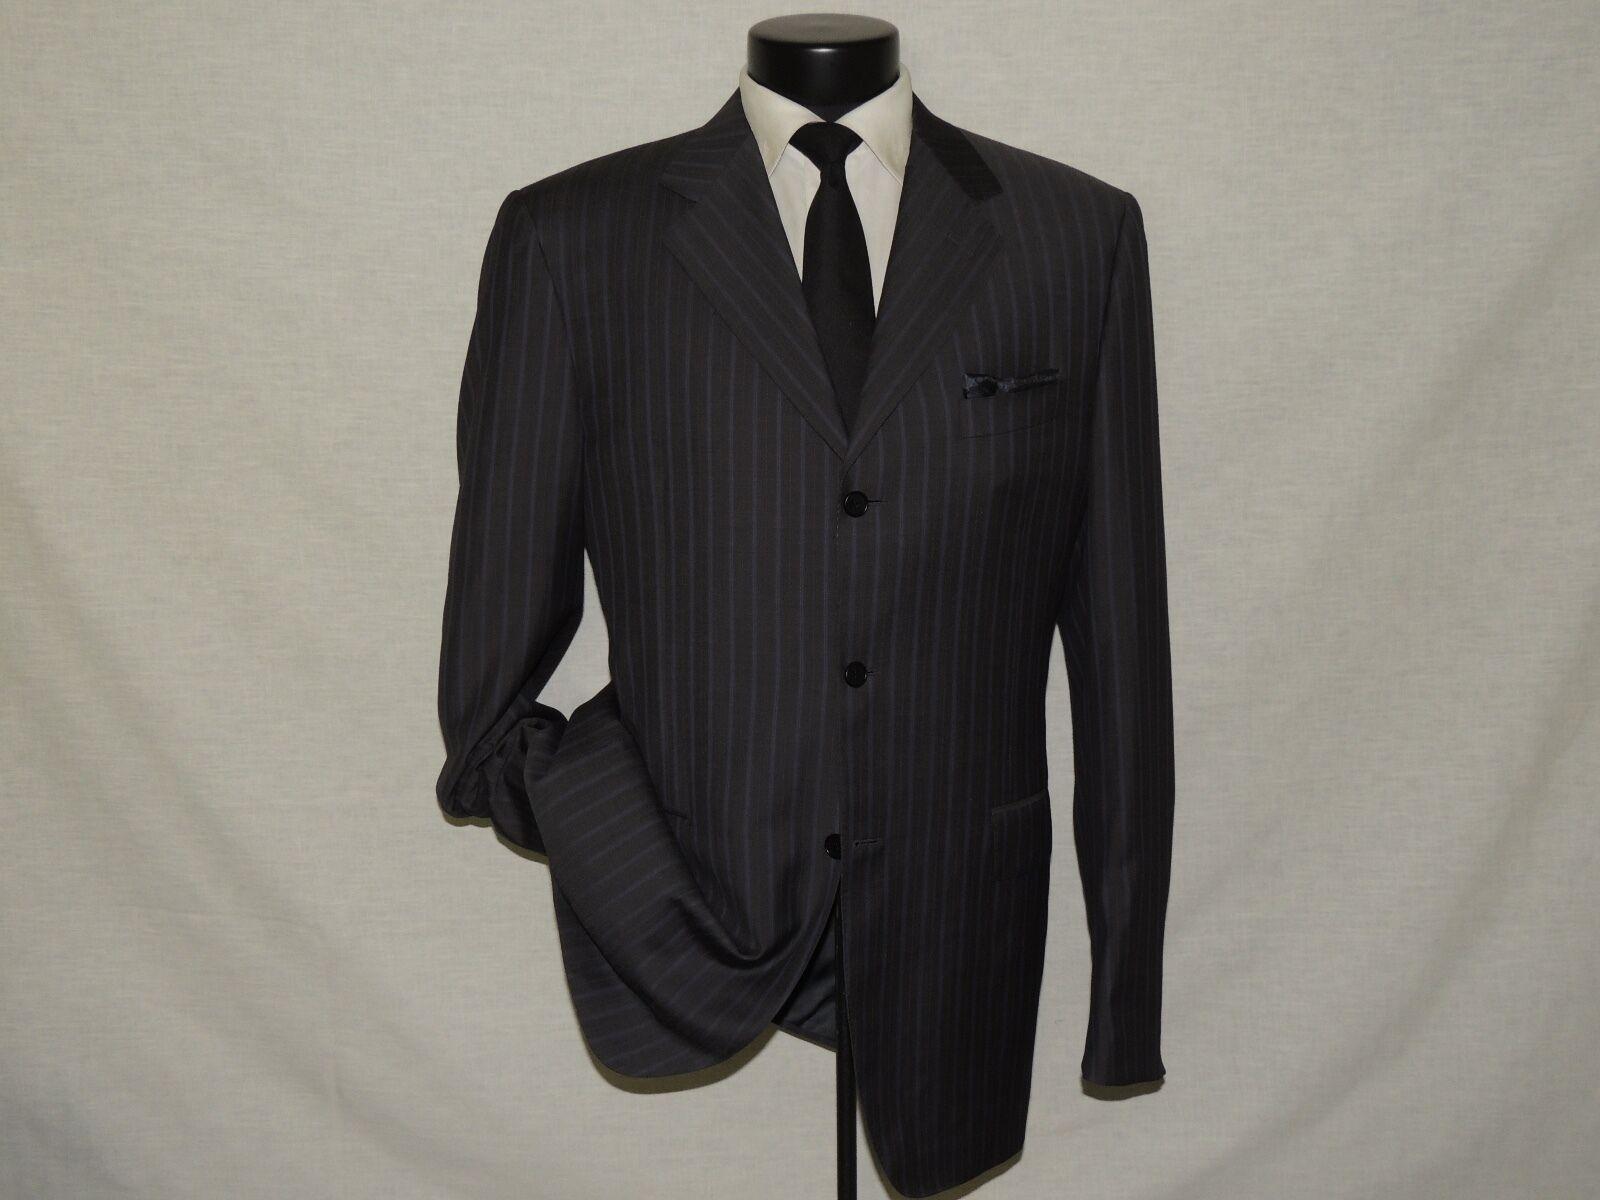 D-761 Canali grau stripe 100% wool super 120's Herren suit coat 42 L  pants 35X33